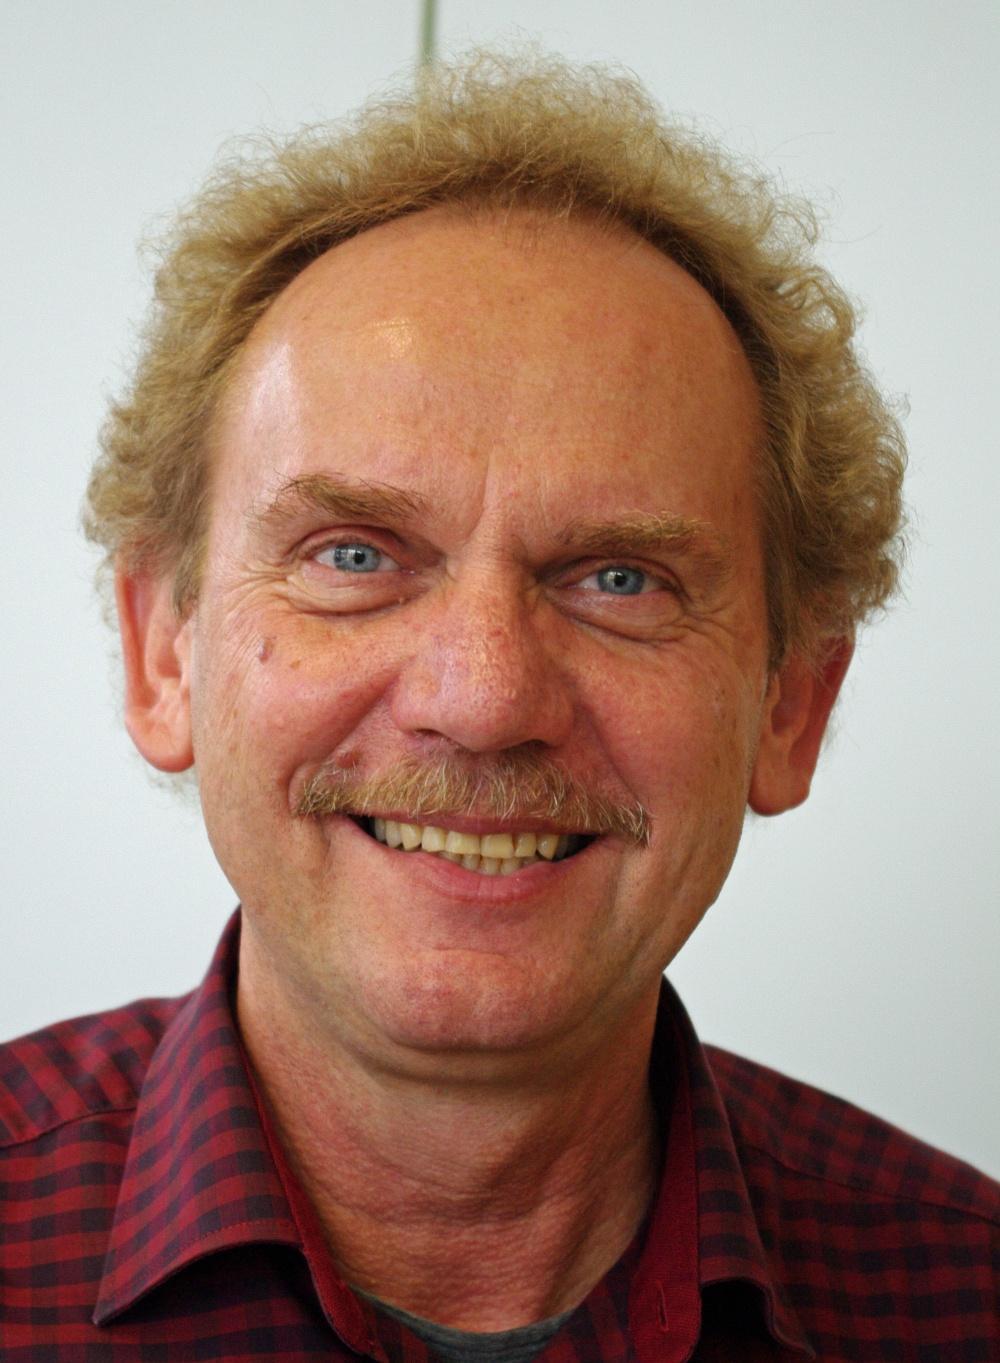 Uwe Lipp